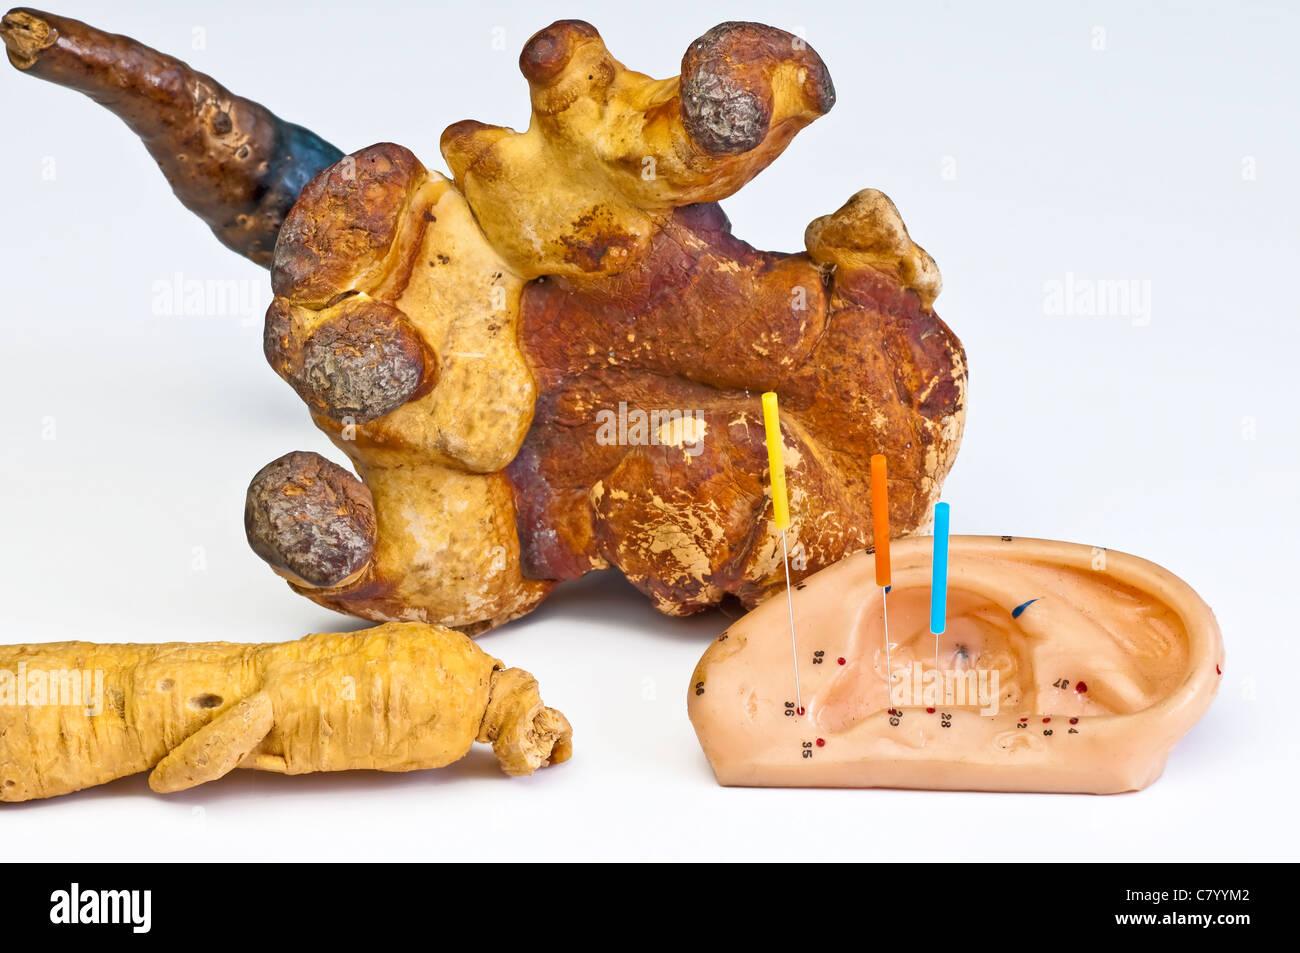 how to grow lingzhi mushroom